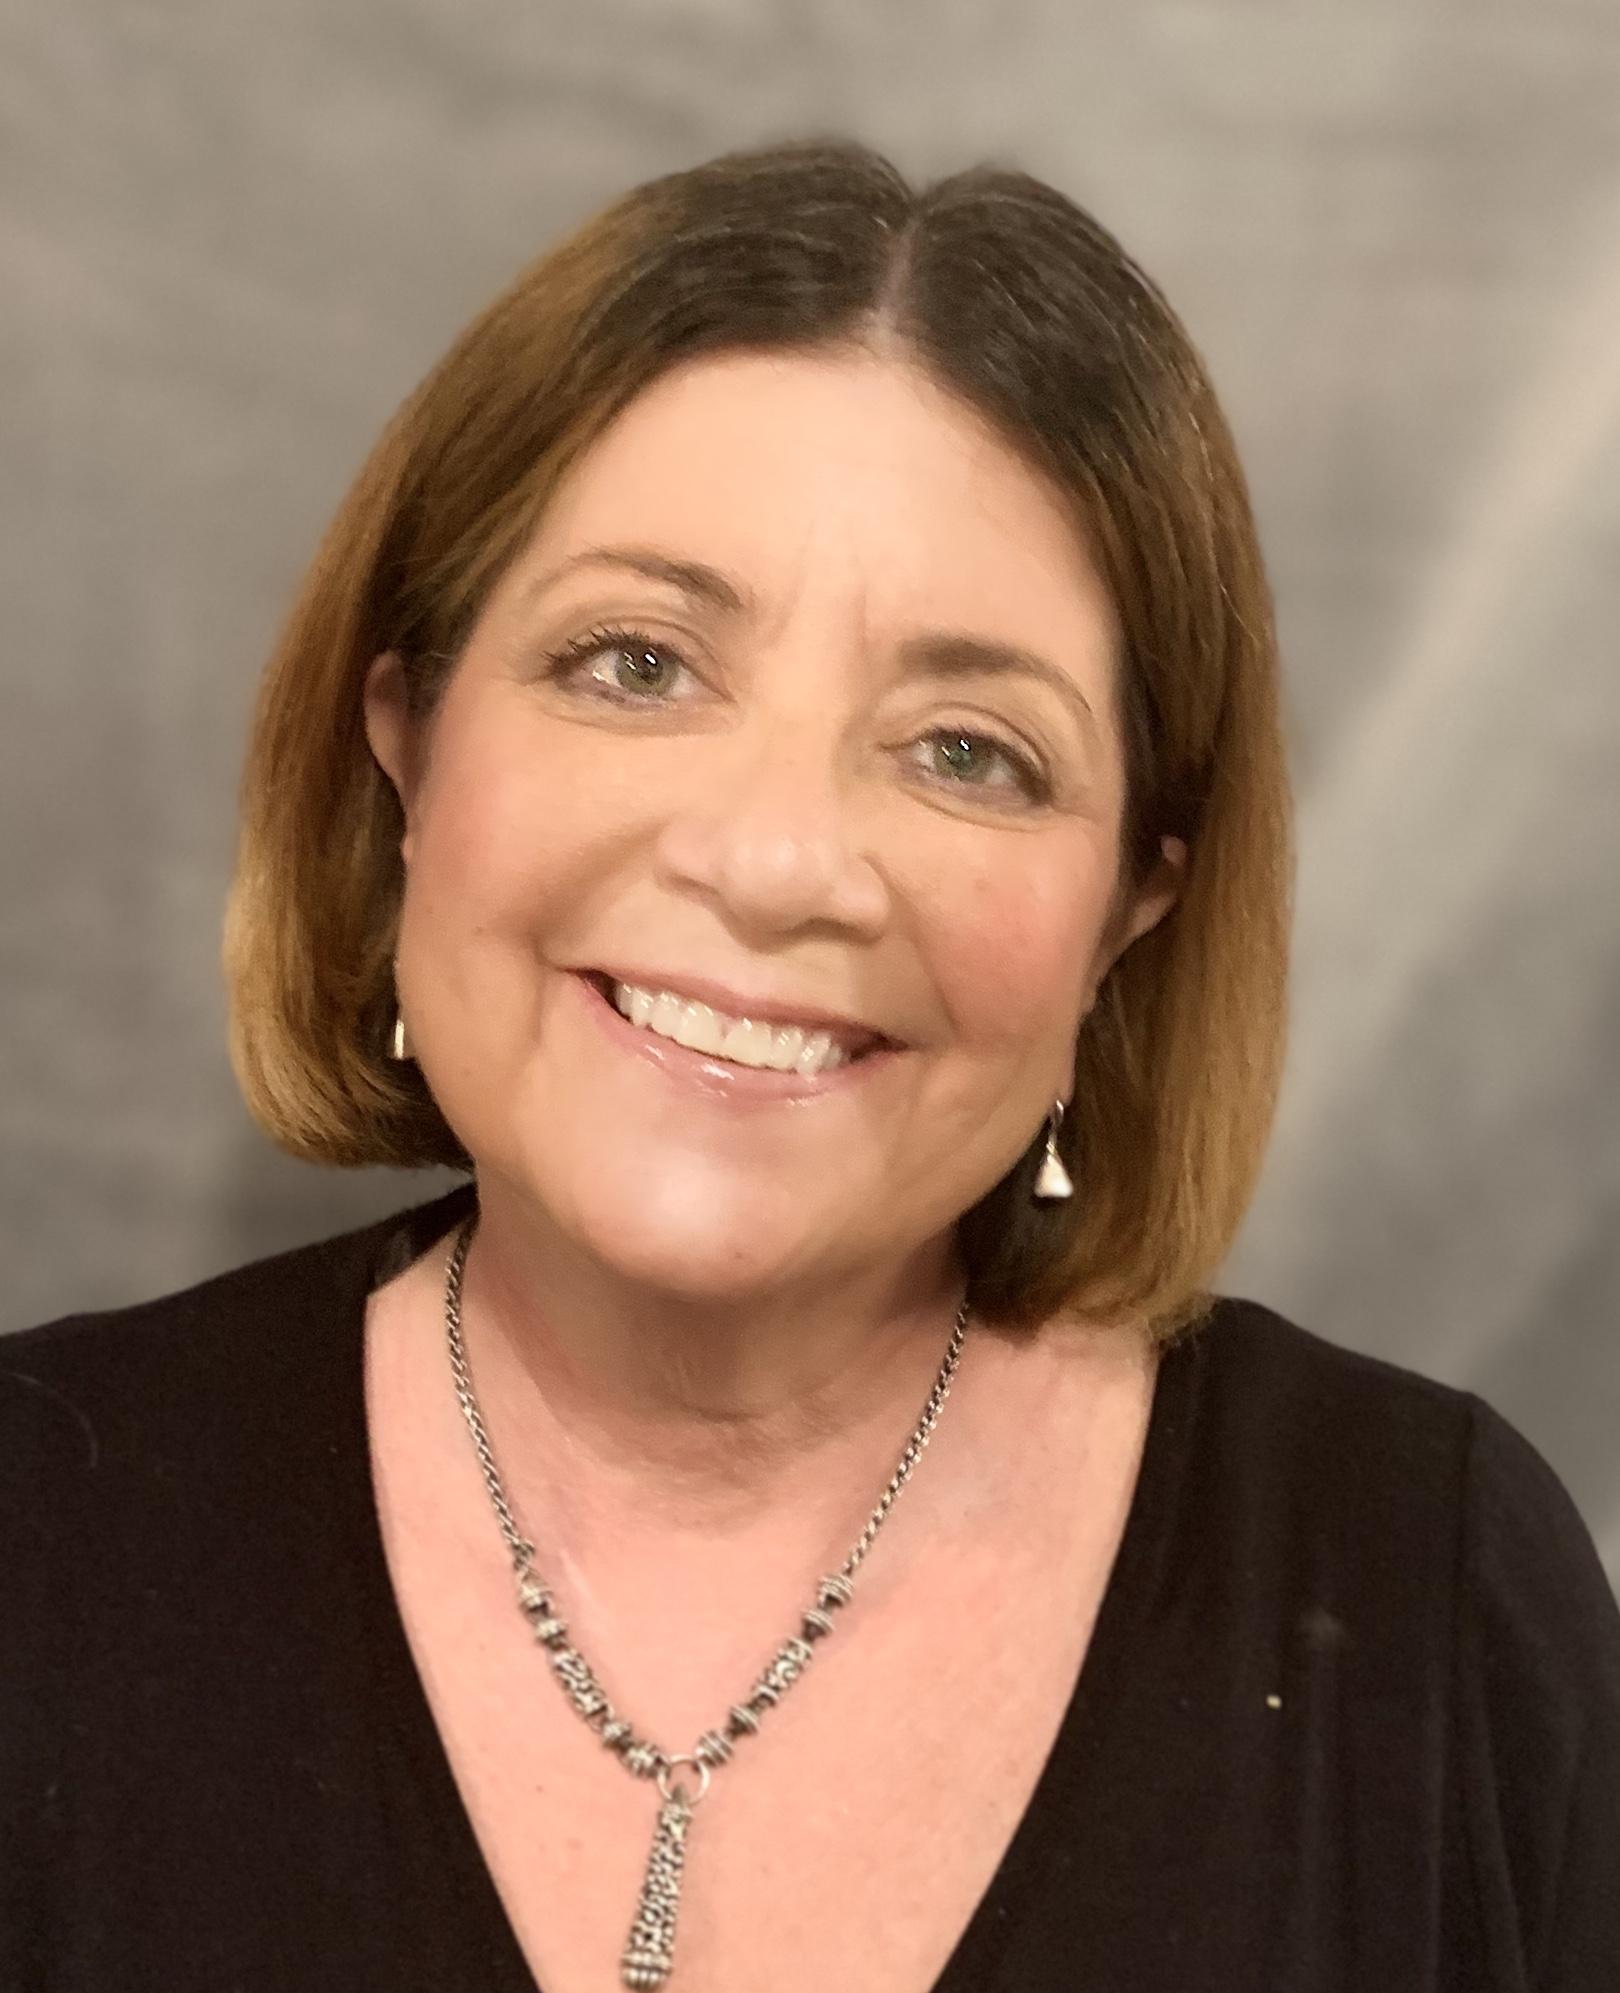 Marlene Stewart   Health and Life Insurance Agent   Athens, GA 30605